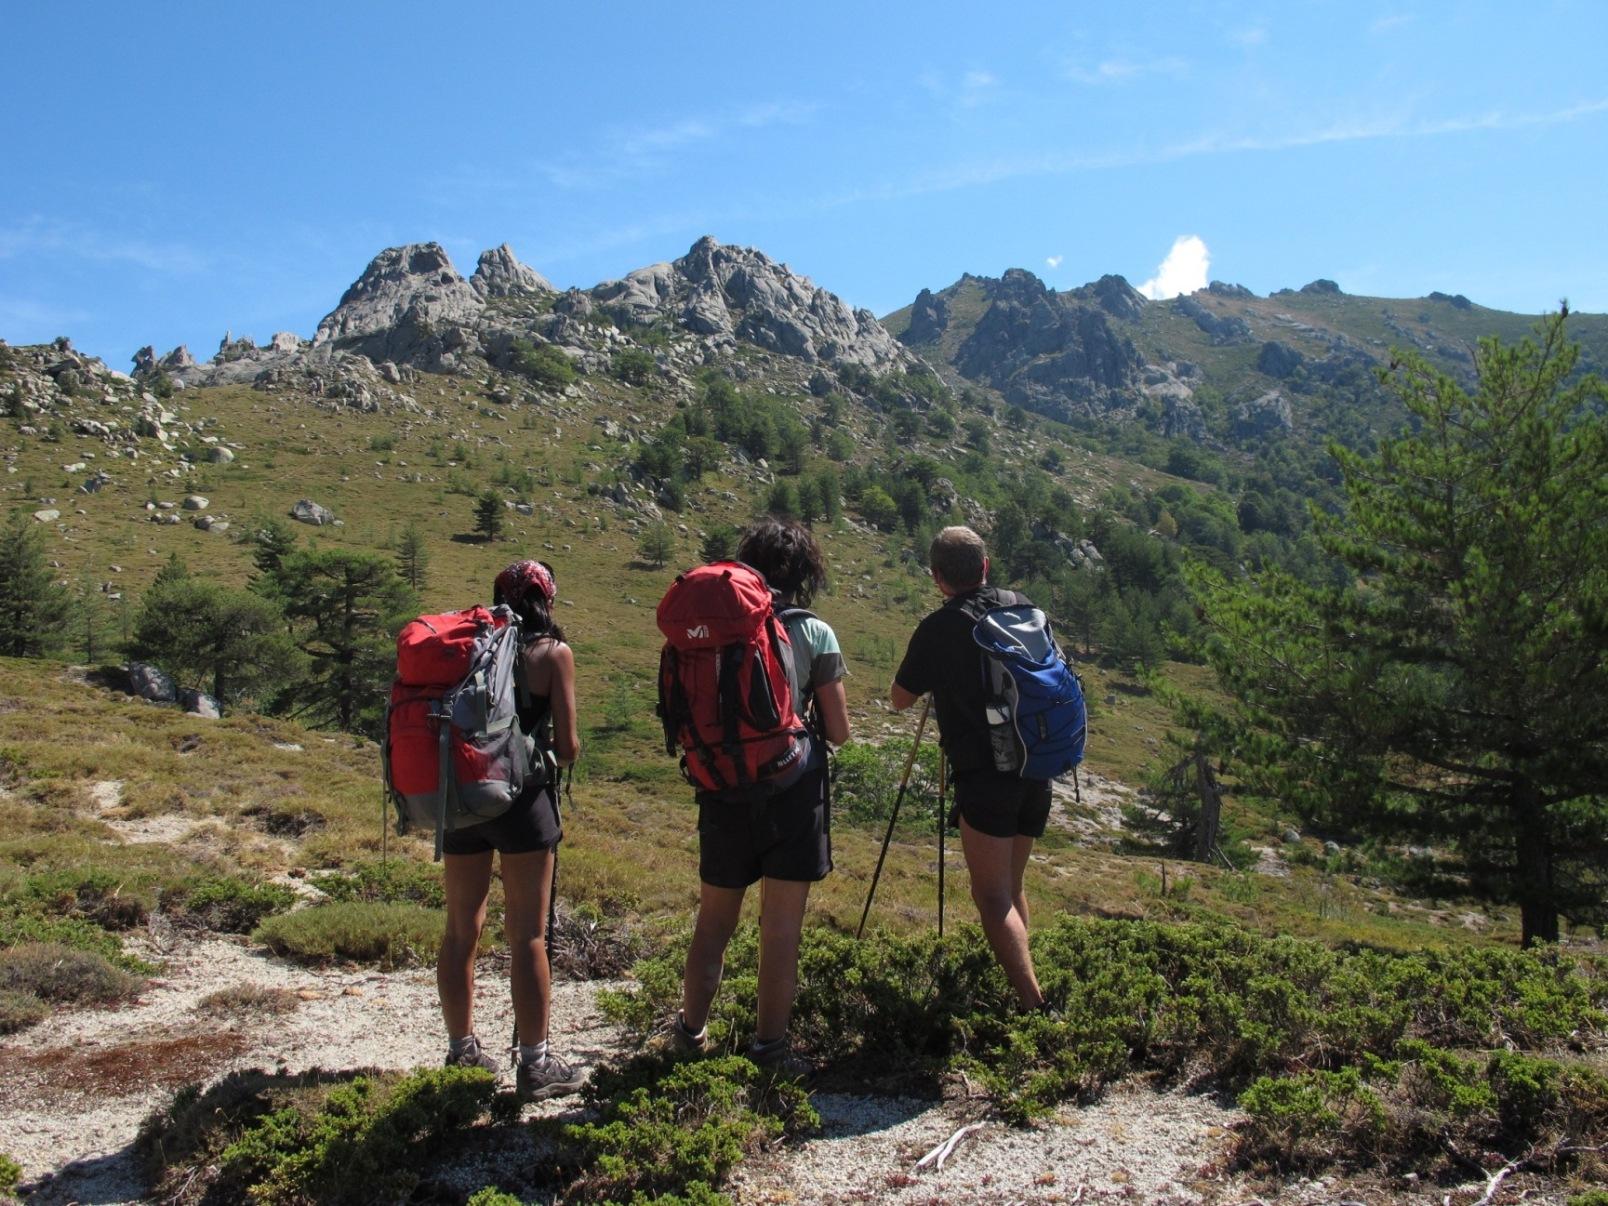 Rando hors chemin en Corse du sud